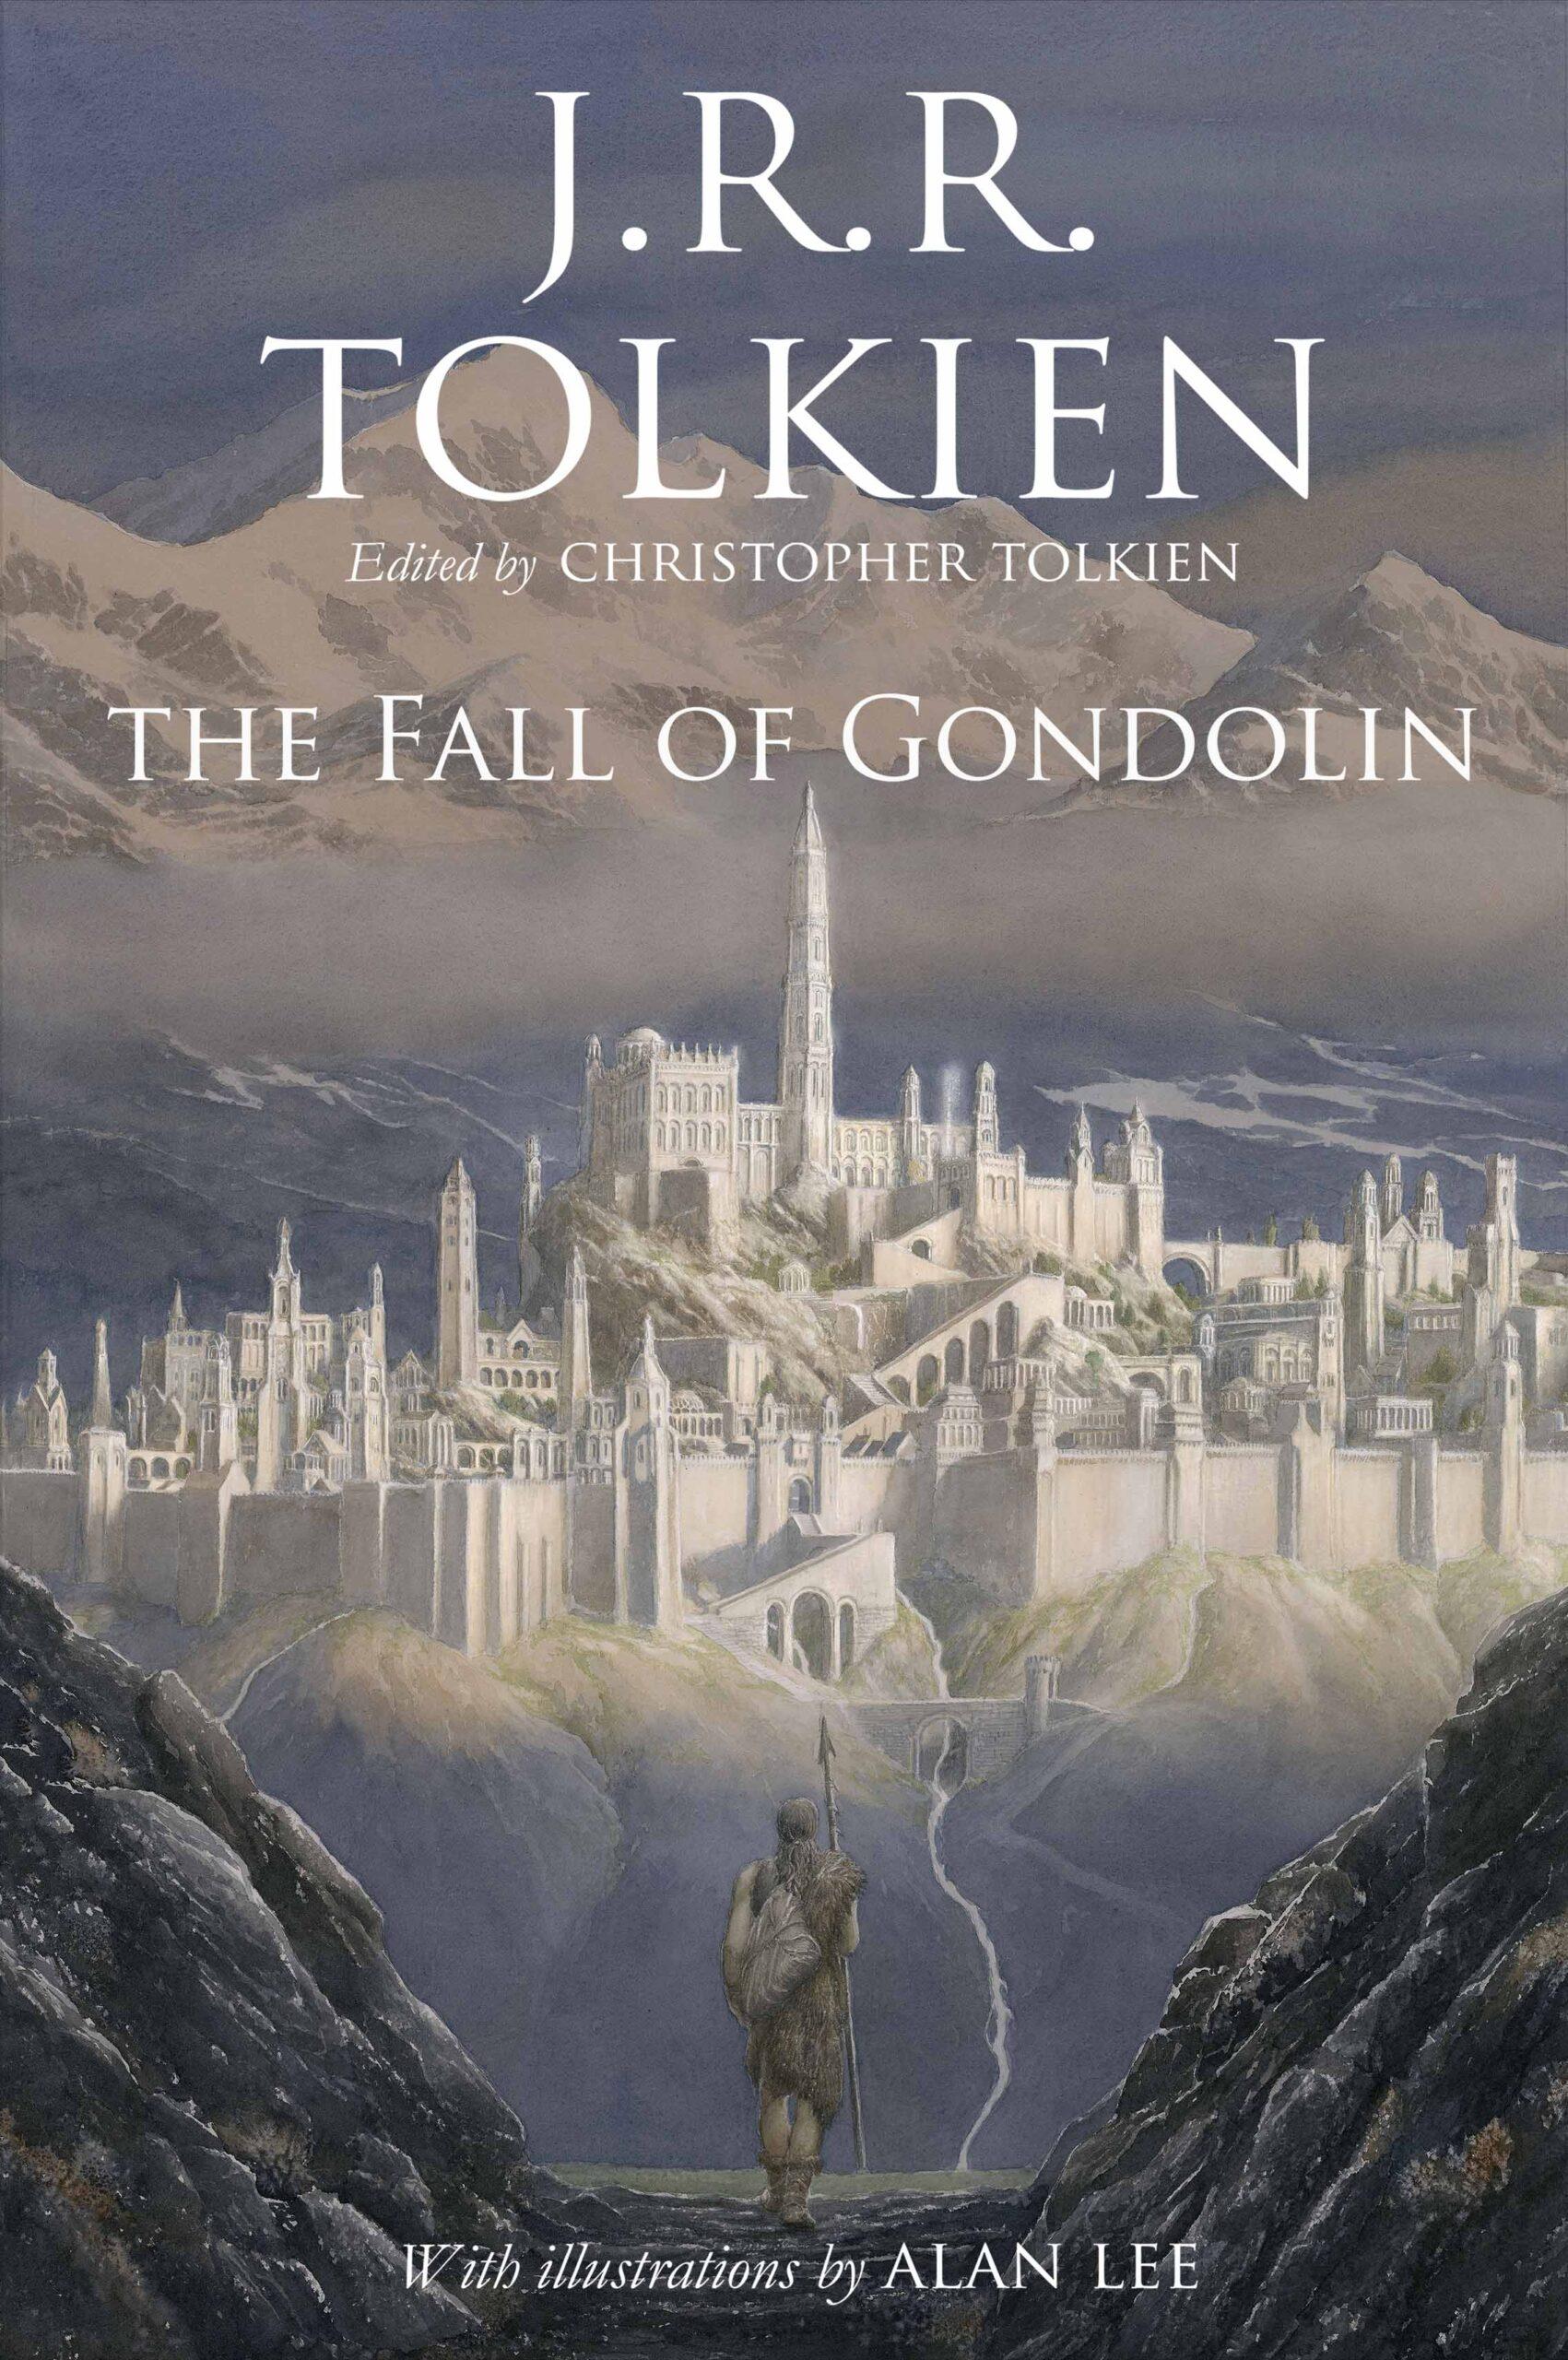 سقوط گوندولین - انتشارات هارپرکالینز - ۲۰۰۷